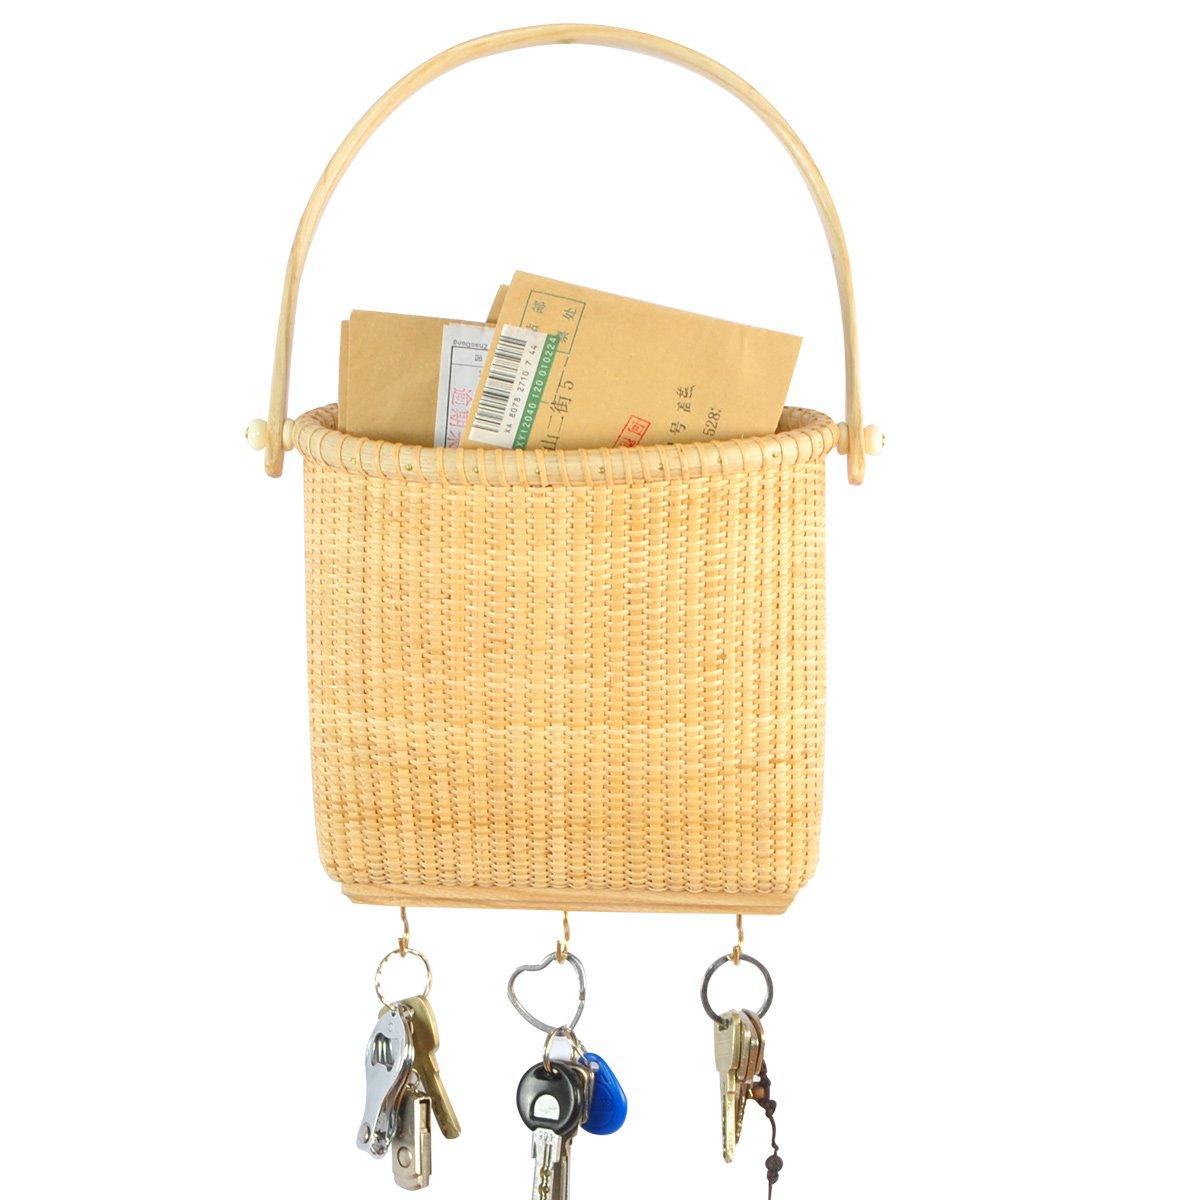 Amazon.com: Teng Tian Basket Wall Hanging Basket Key Holder: Home ...